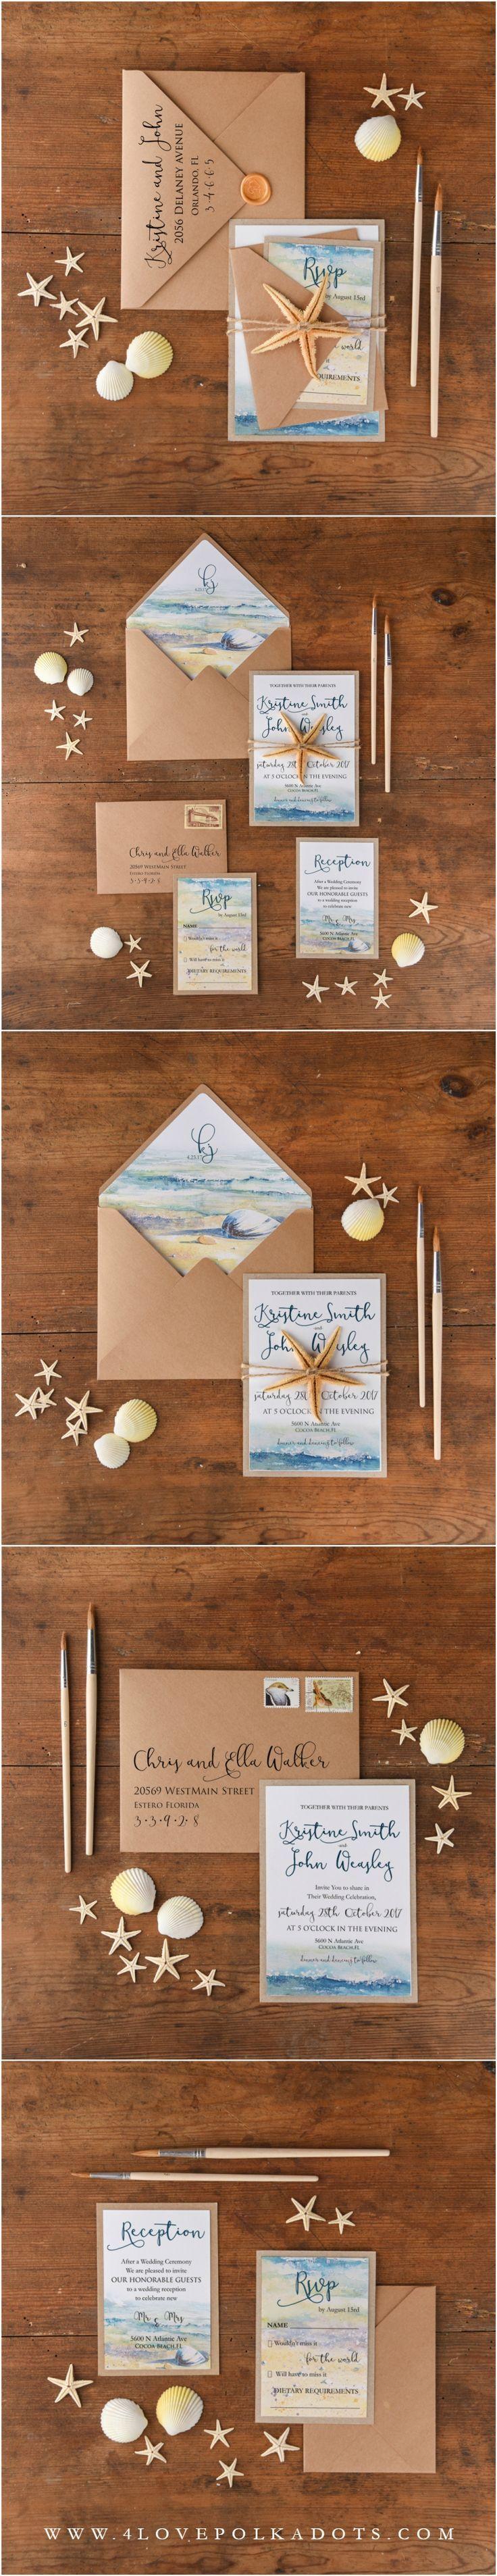 Best 25 Beach wedding invitations ideas – Wedding Invites Beach